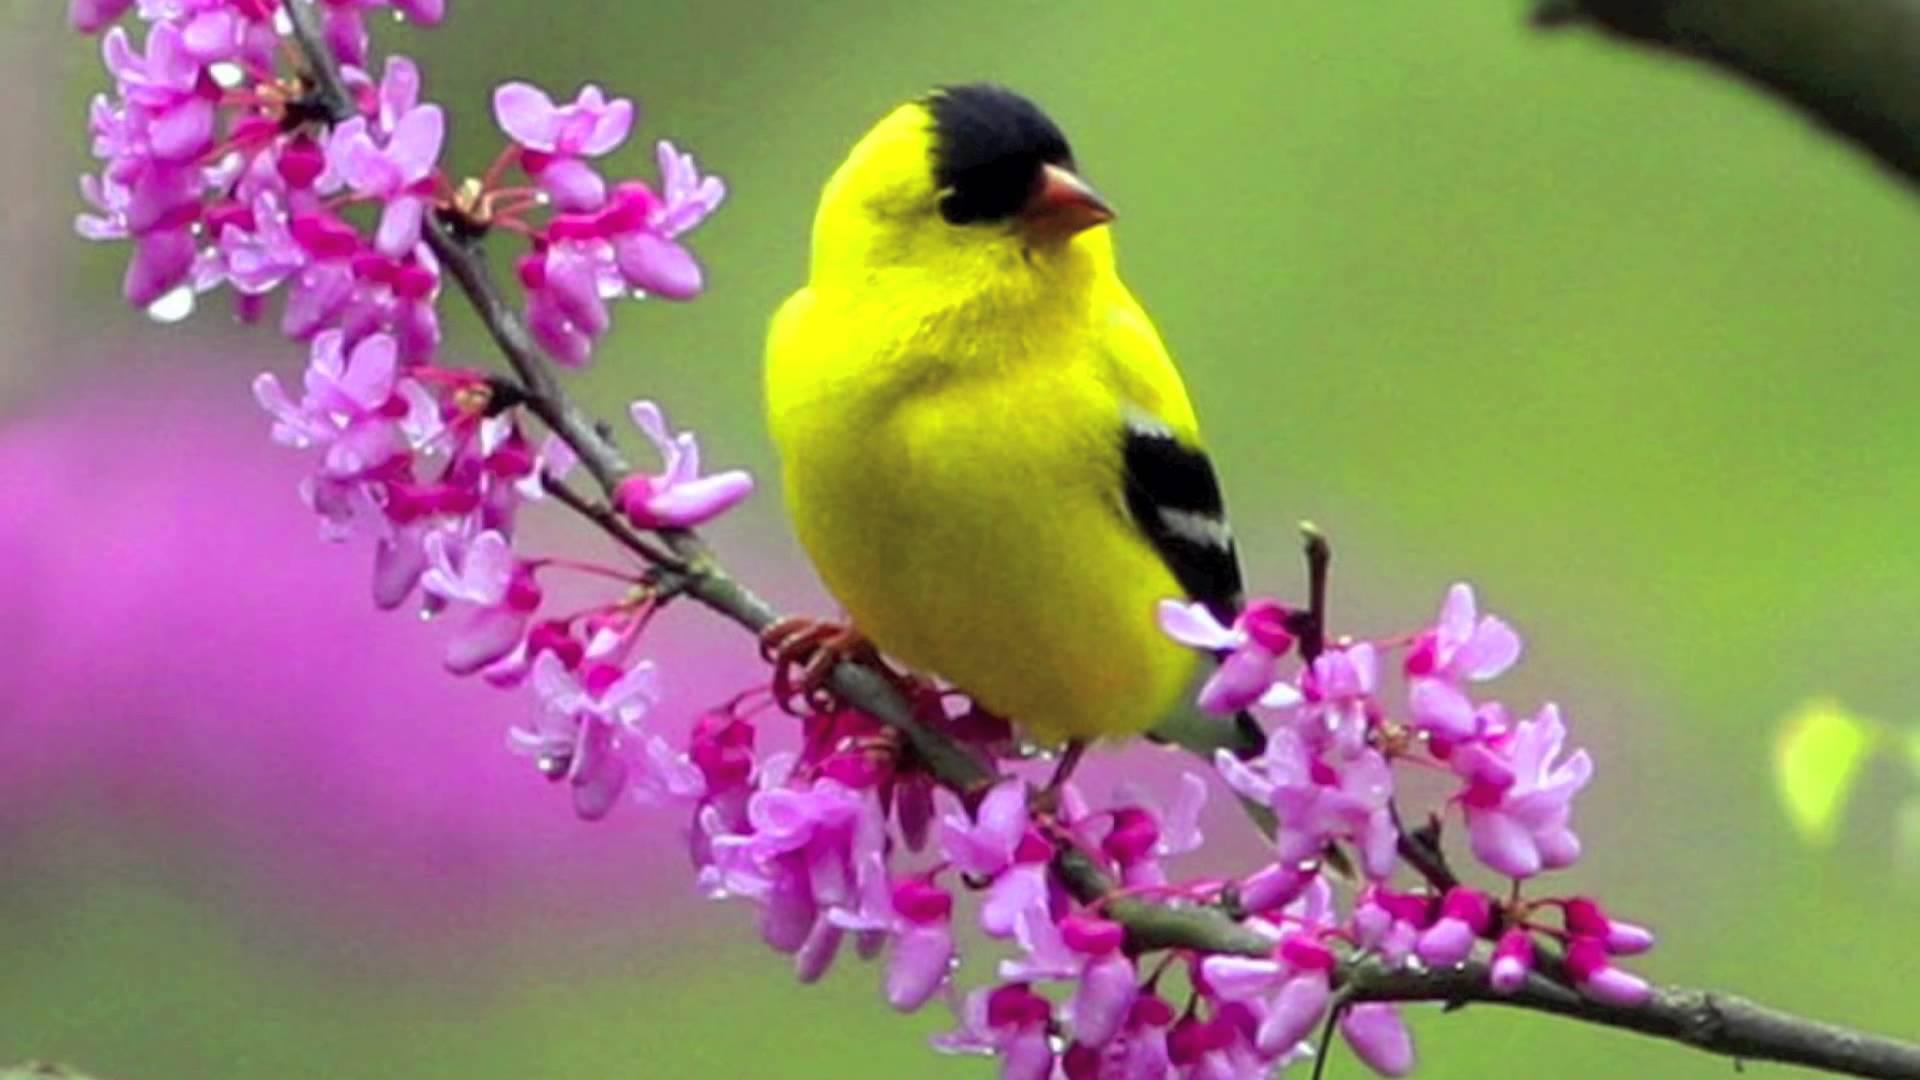 Flowers and Birds Wallpaper - WallpaperSafari